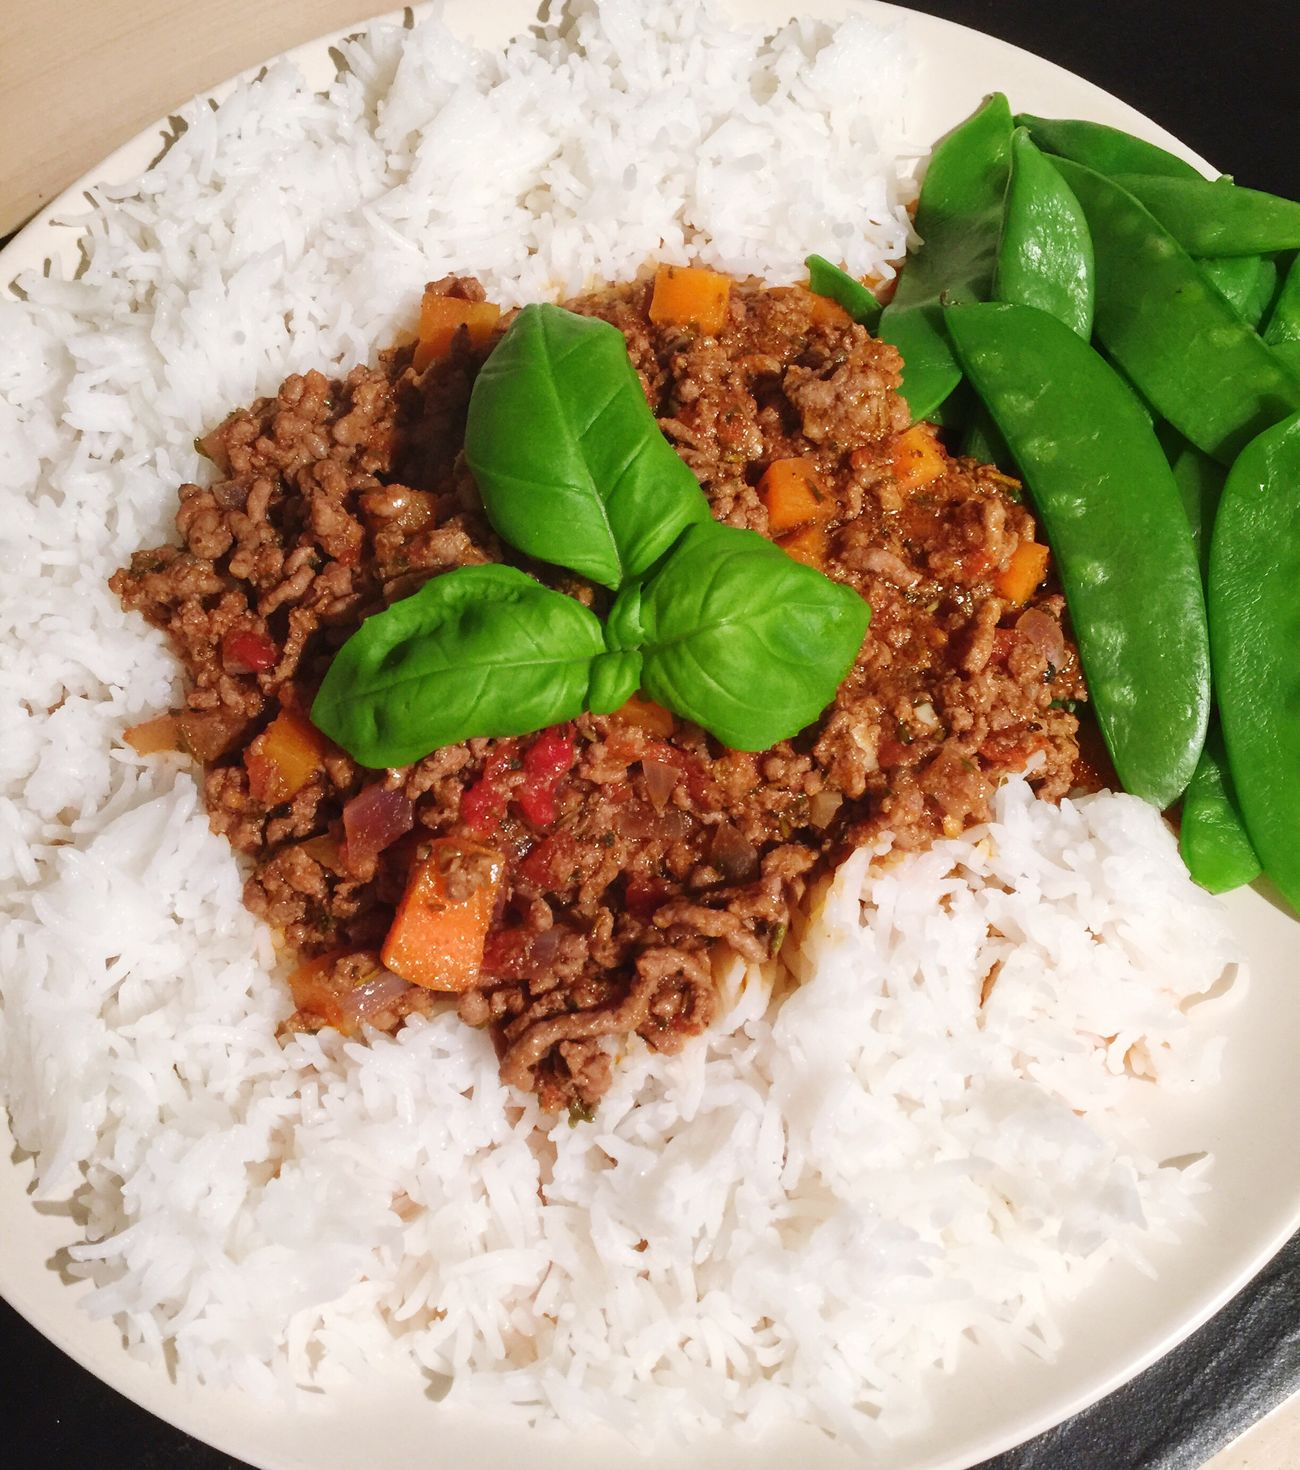 Greek Food Home Cooked Dinner